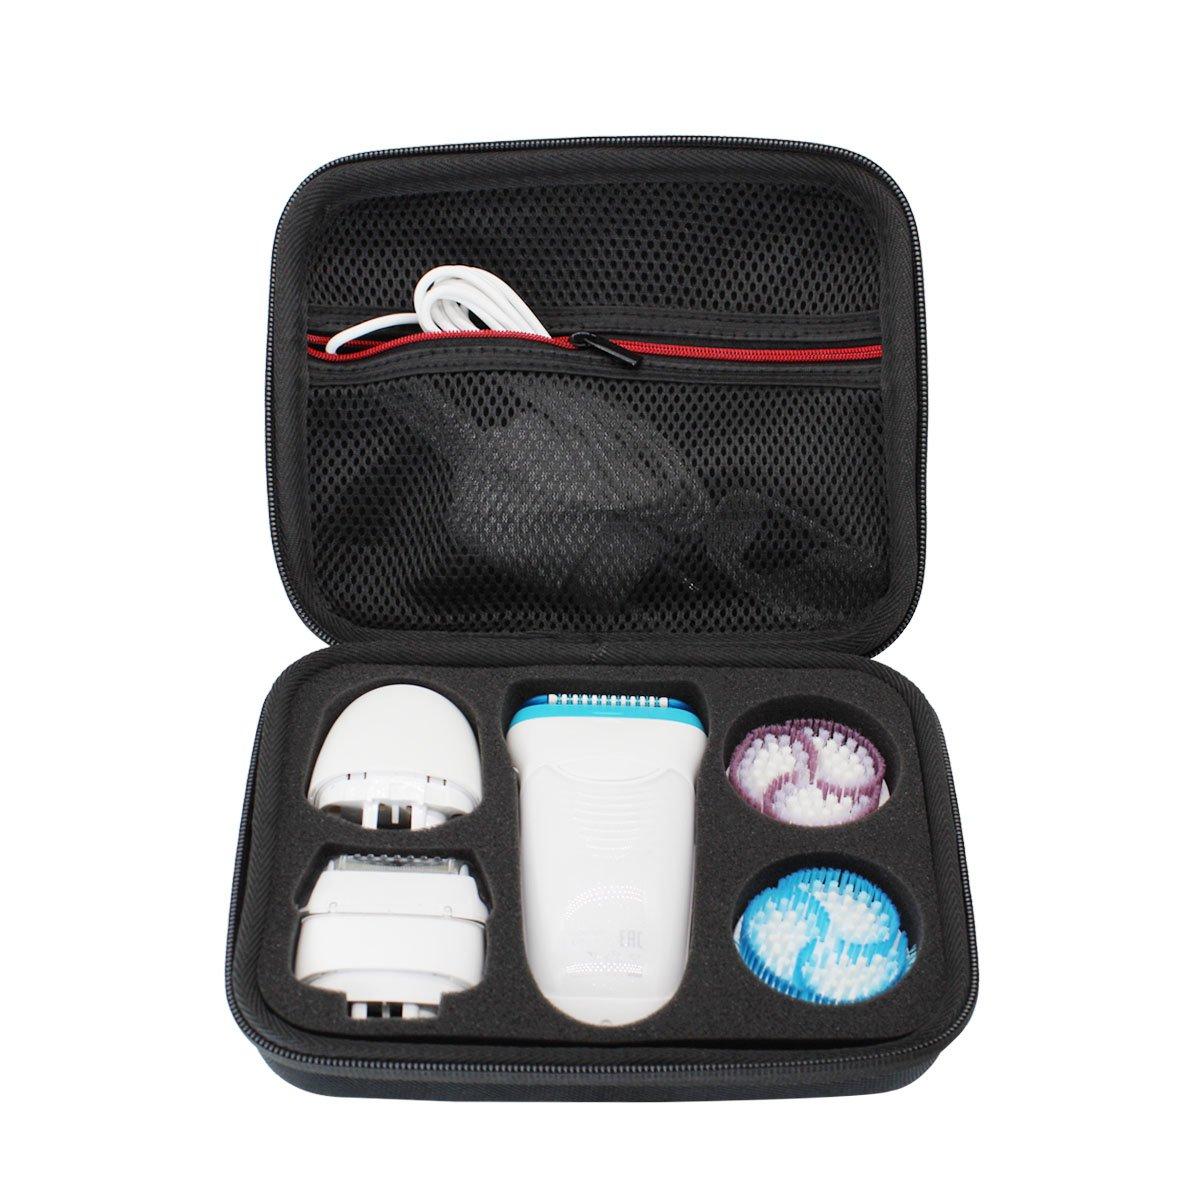 Hard Travel Case Bag for Braun Silk Epil 9 Women's Wet and Dry Cordless Epilator by VIVENS